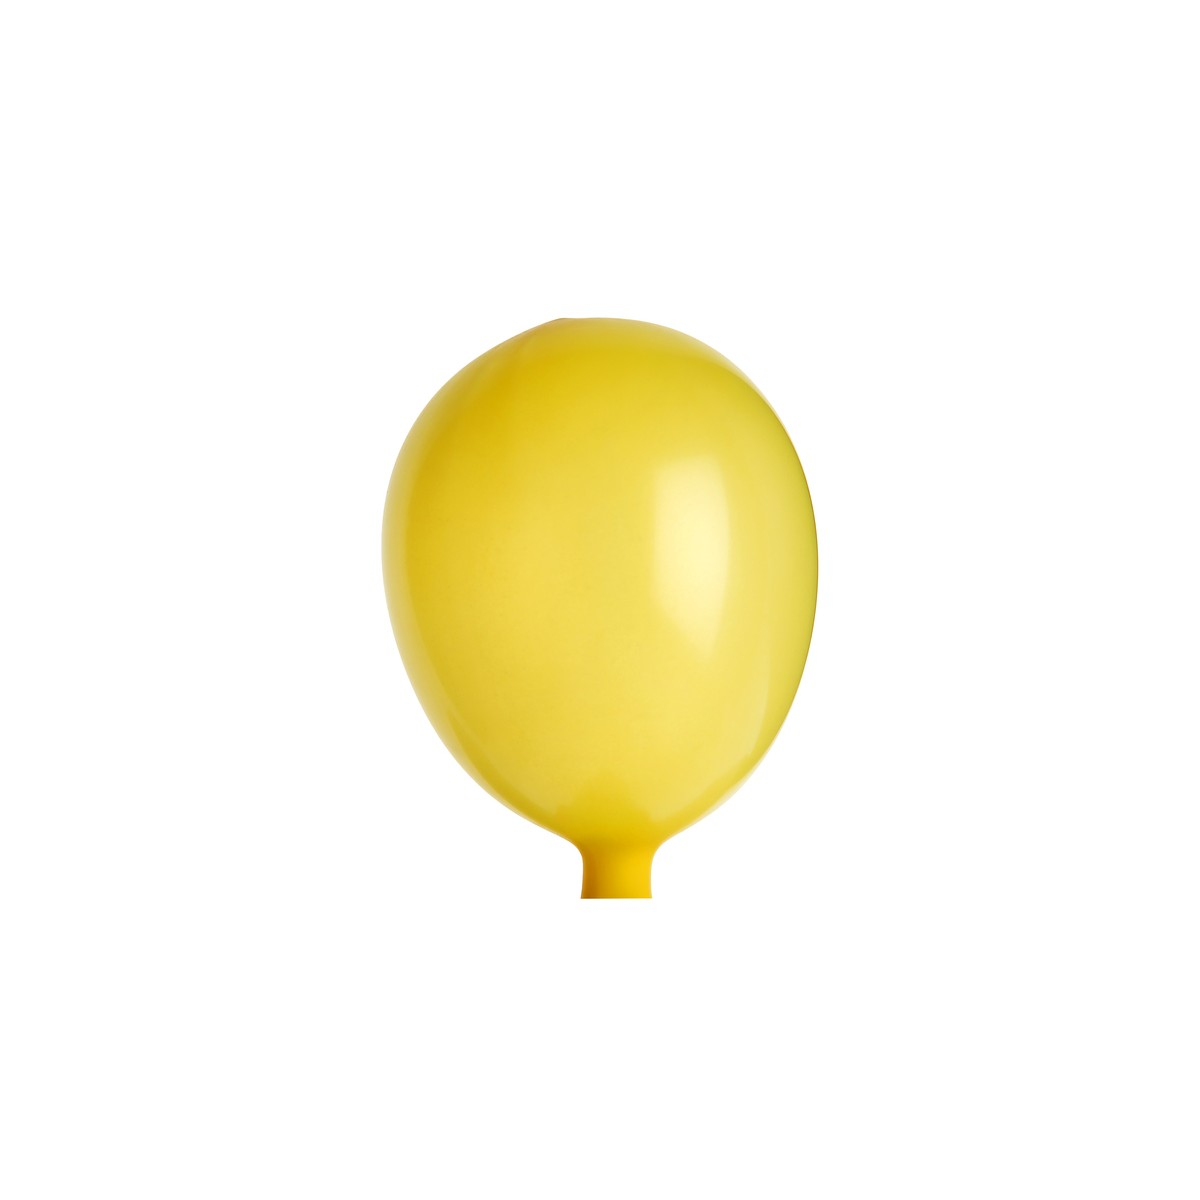 Mini Ballon de Baudruche Jaune x 25